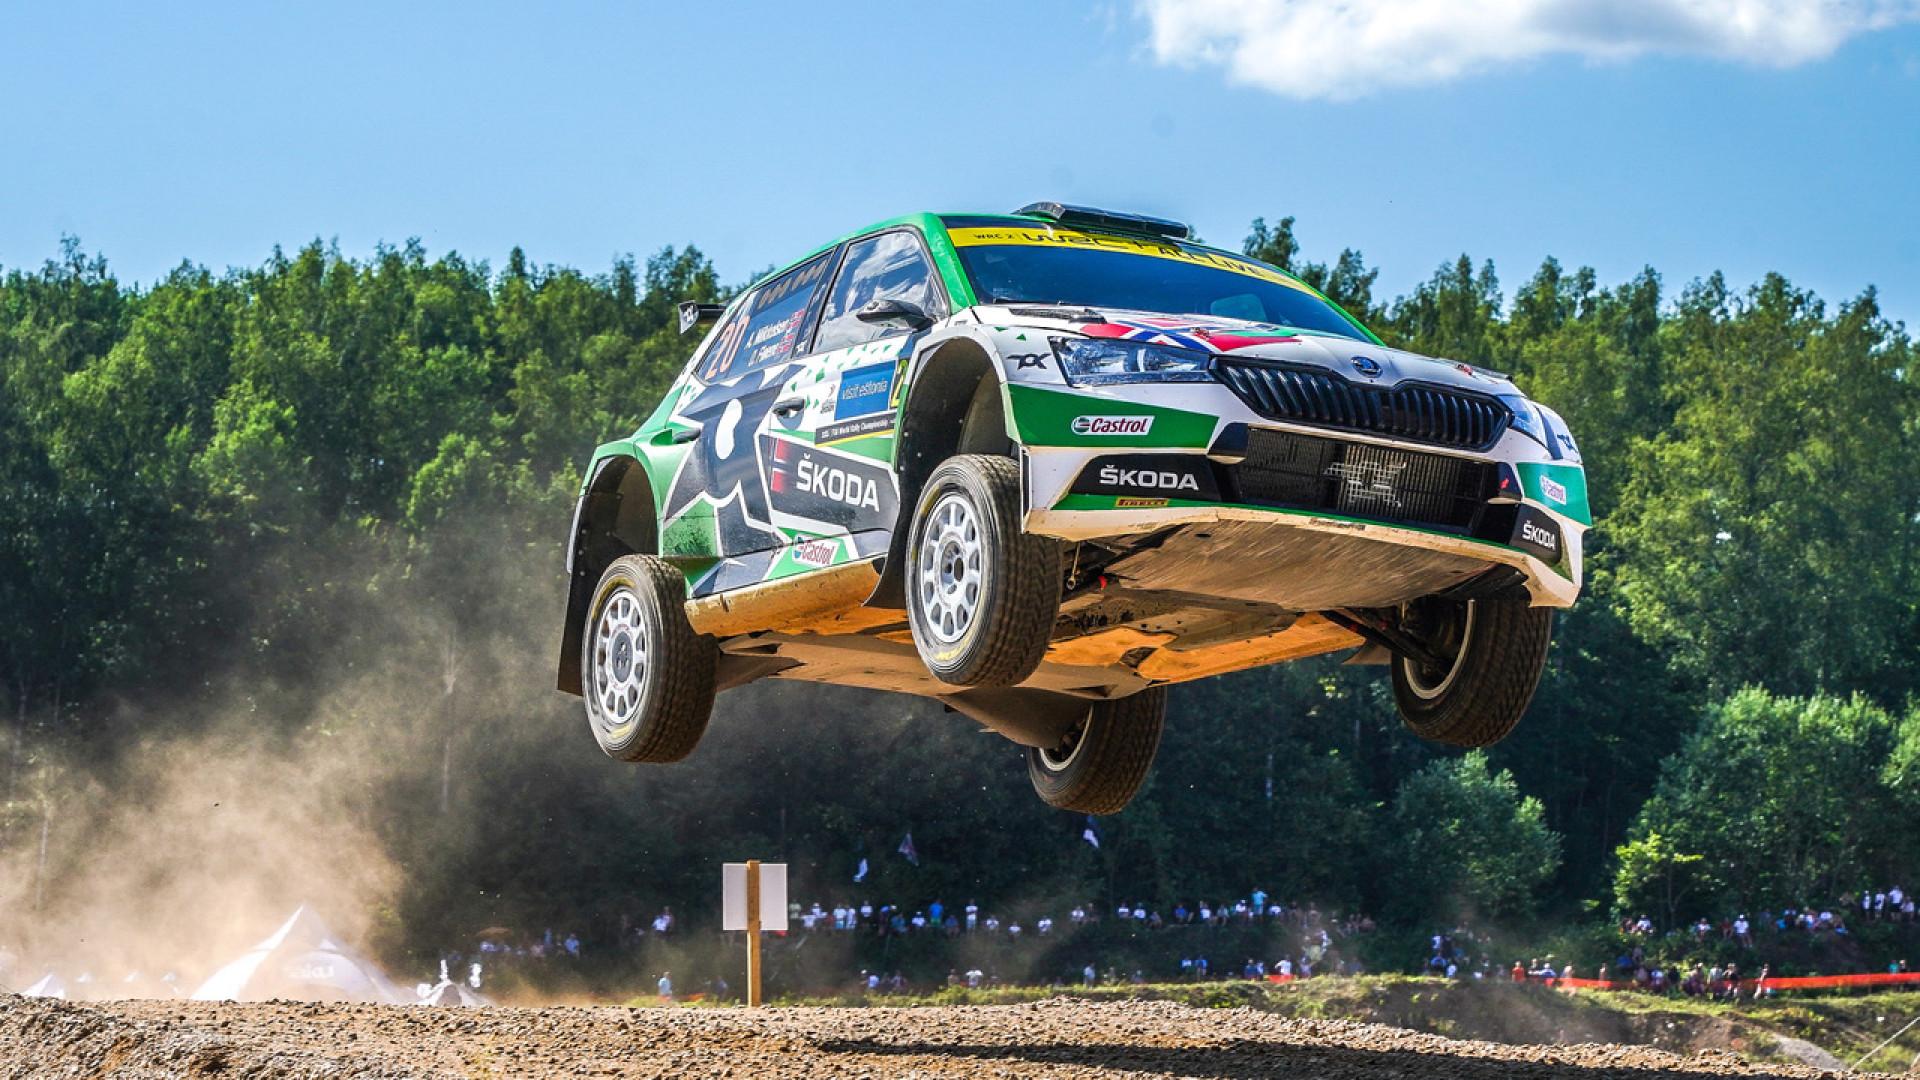 WRC: 11º Rally Estonia [15-18 Julio] - Página 3 170721_AT-AndreasMikkelsen-RallyEstonia-2021_01